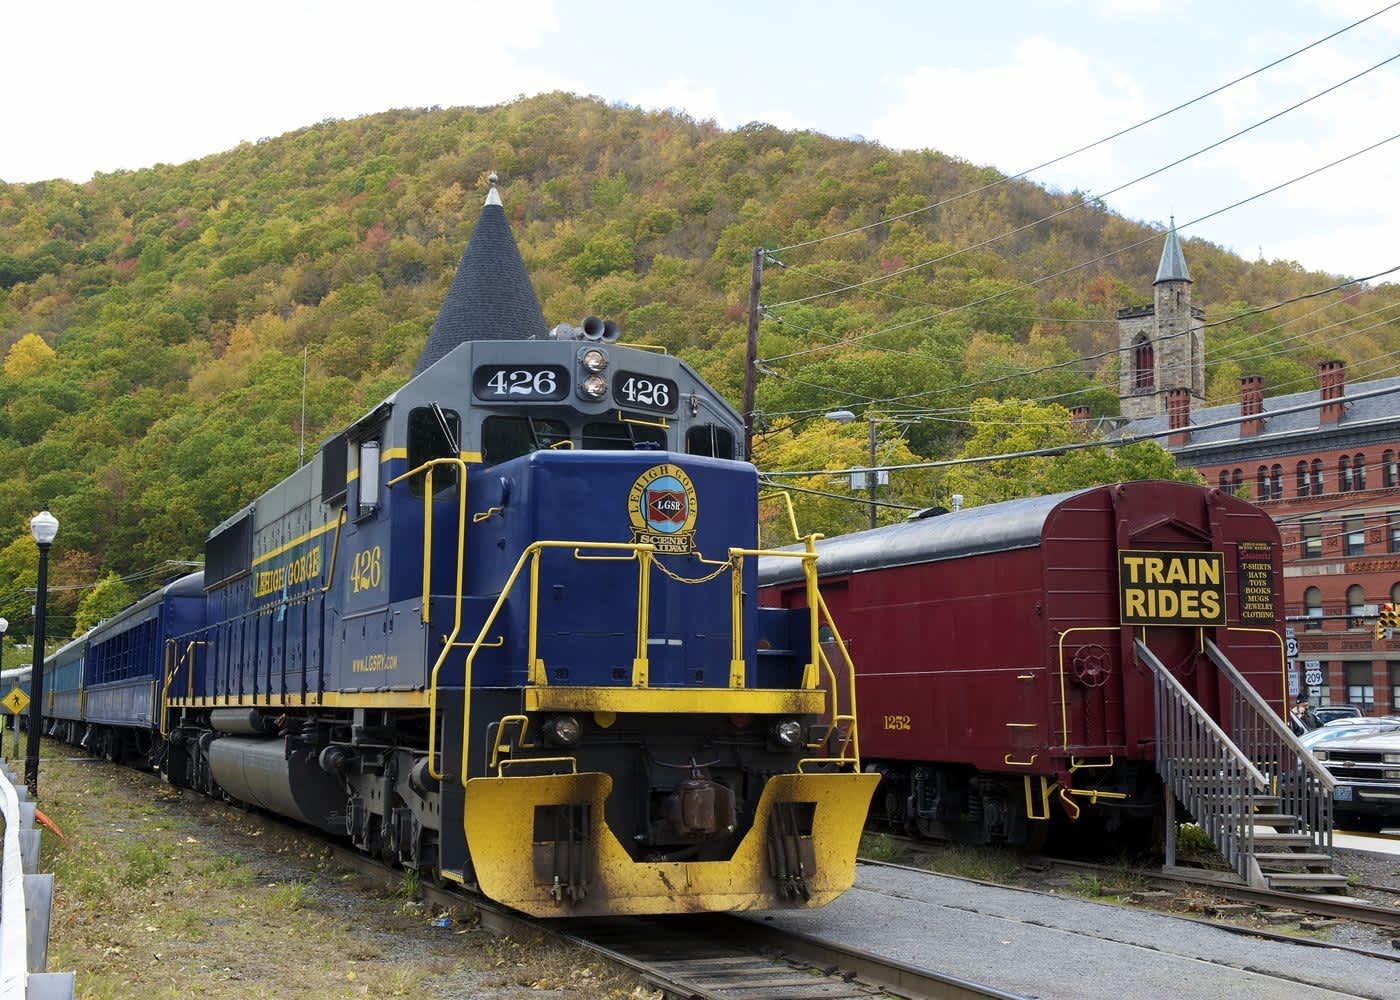 Lehigh Gorge Scenic Railway Jim Thorpe Pa 18229